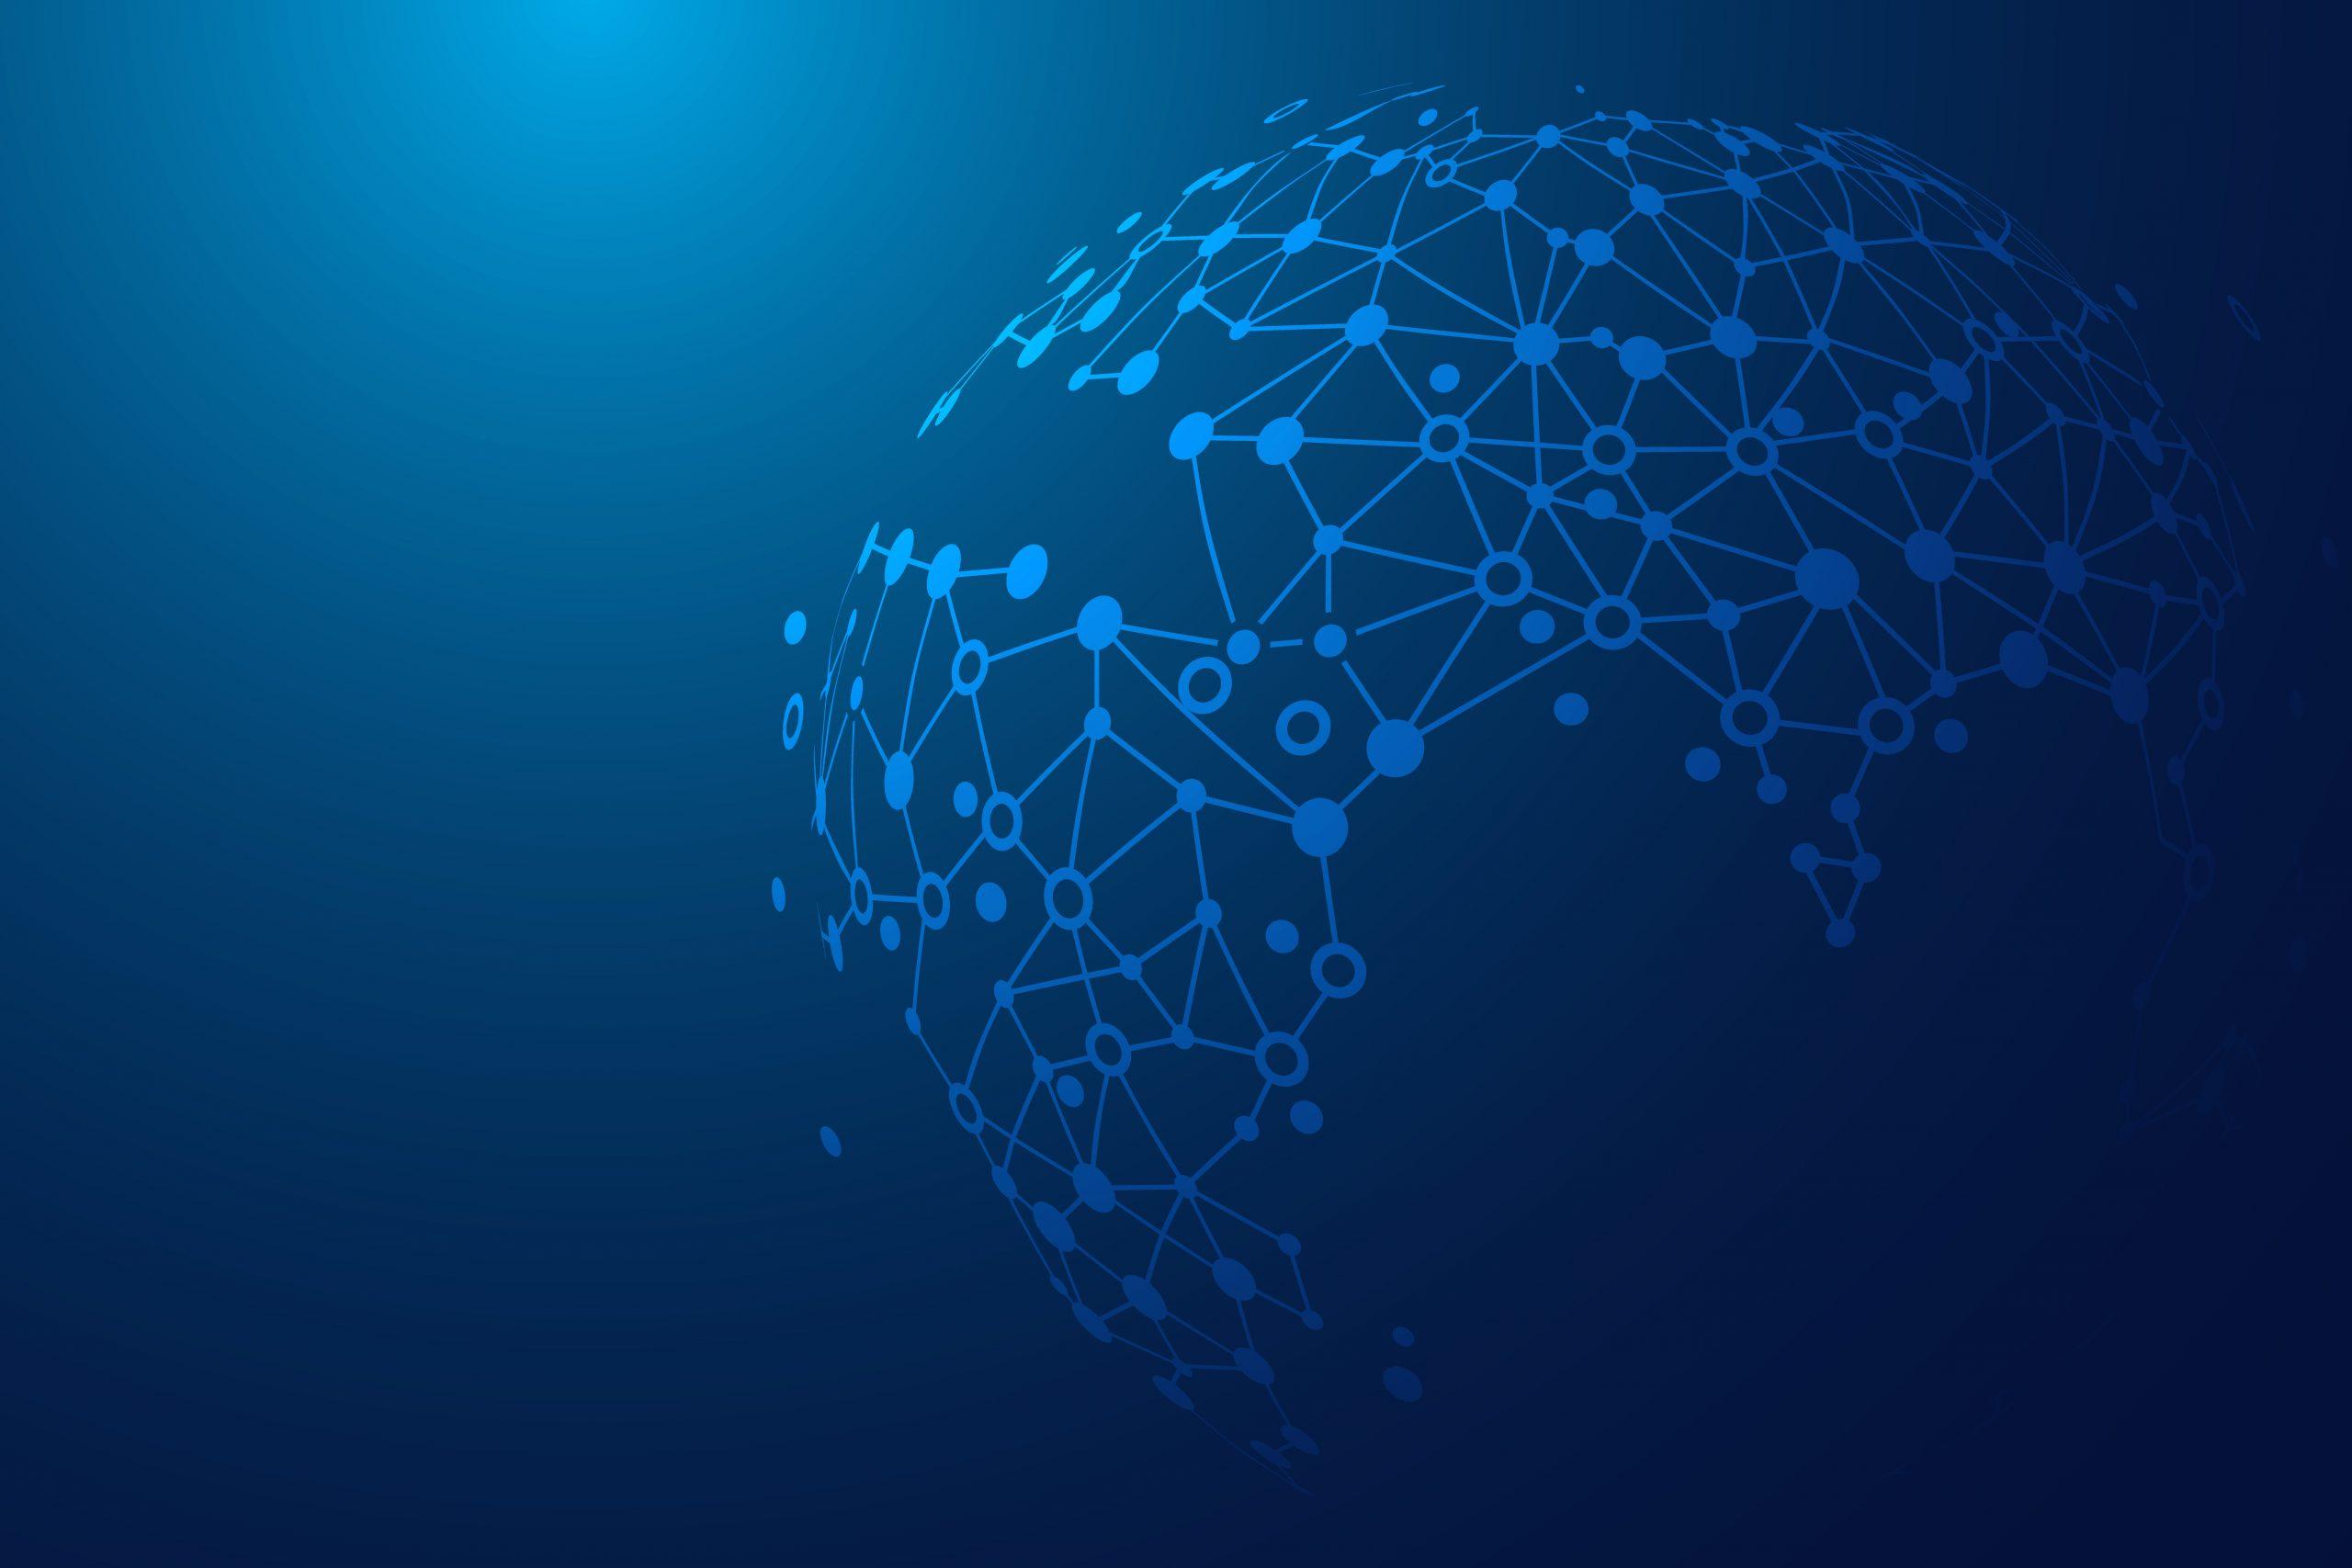 Citi Launches Their Cross-border B2B Payments Platform